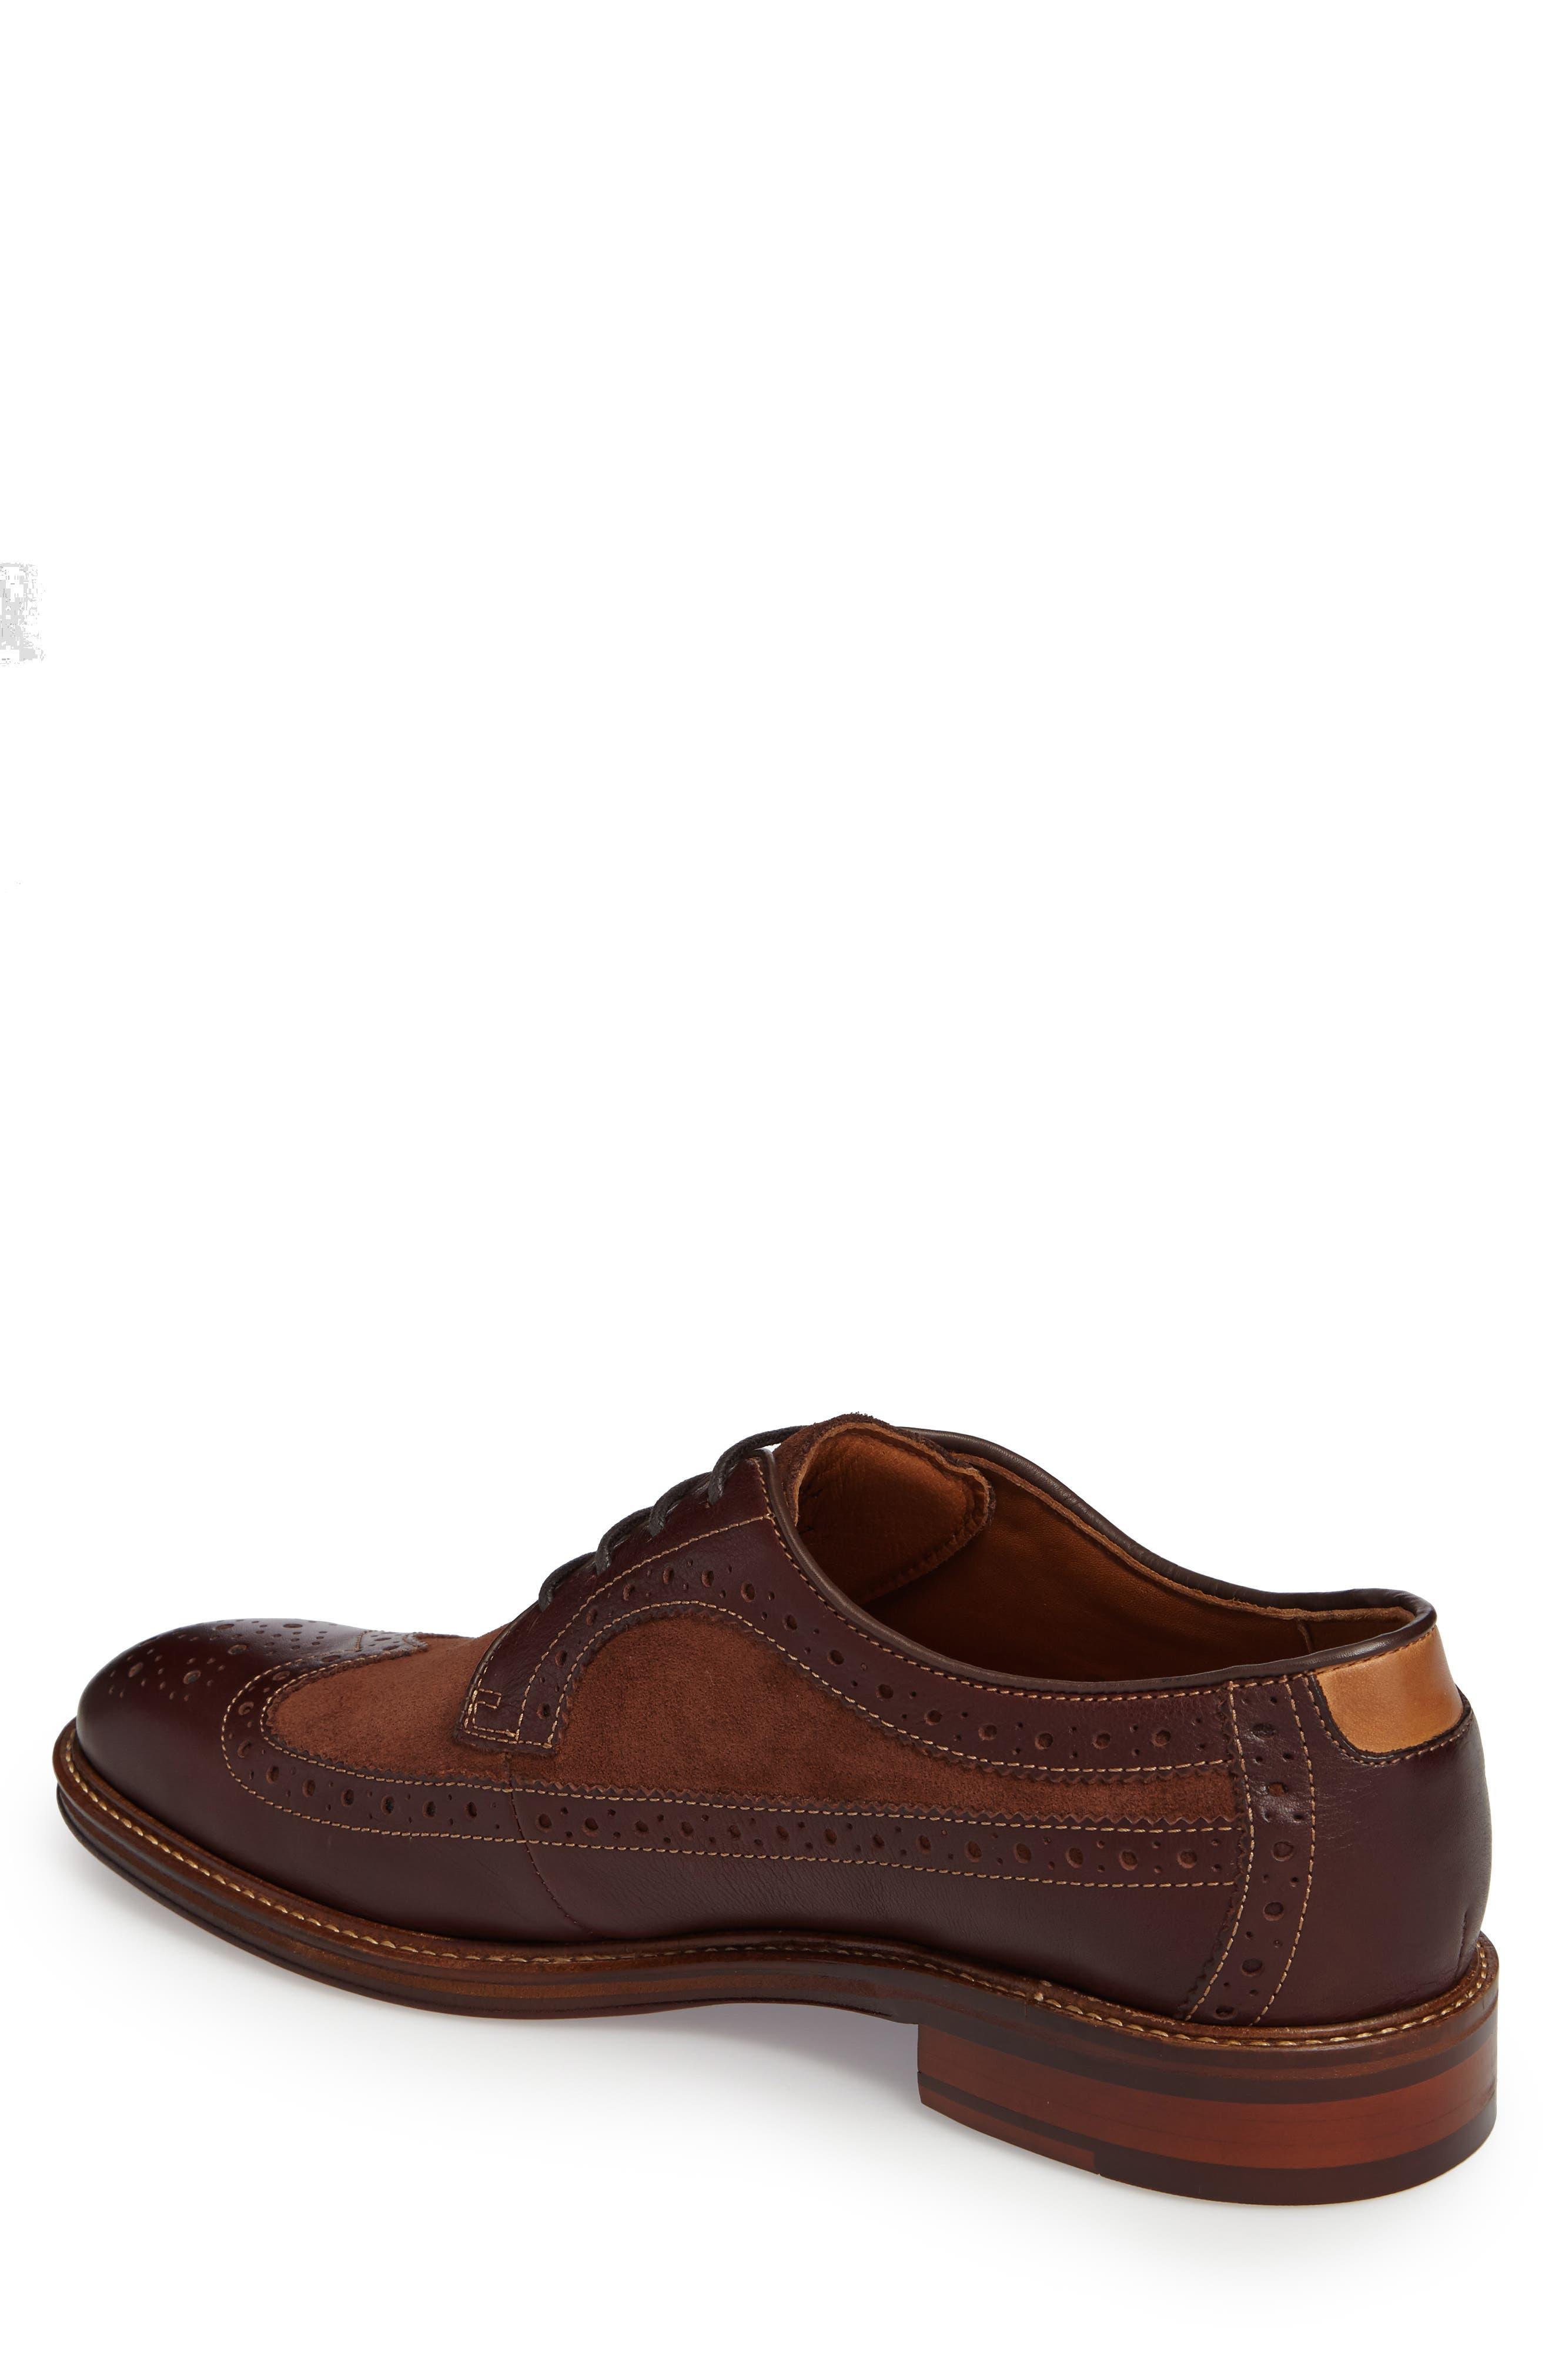 Warner Spectator Shoe,                             Alternate thumbnail 5, color,